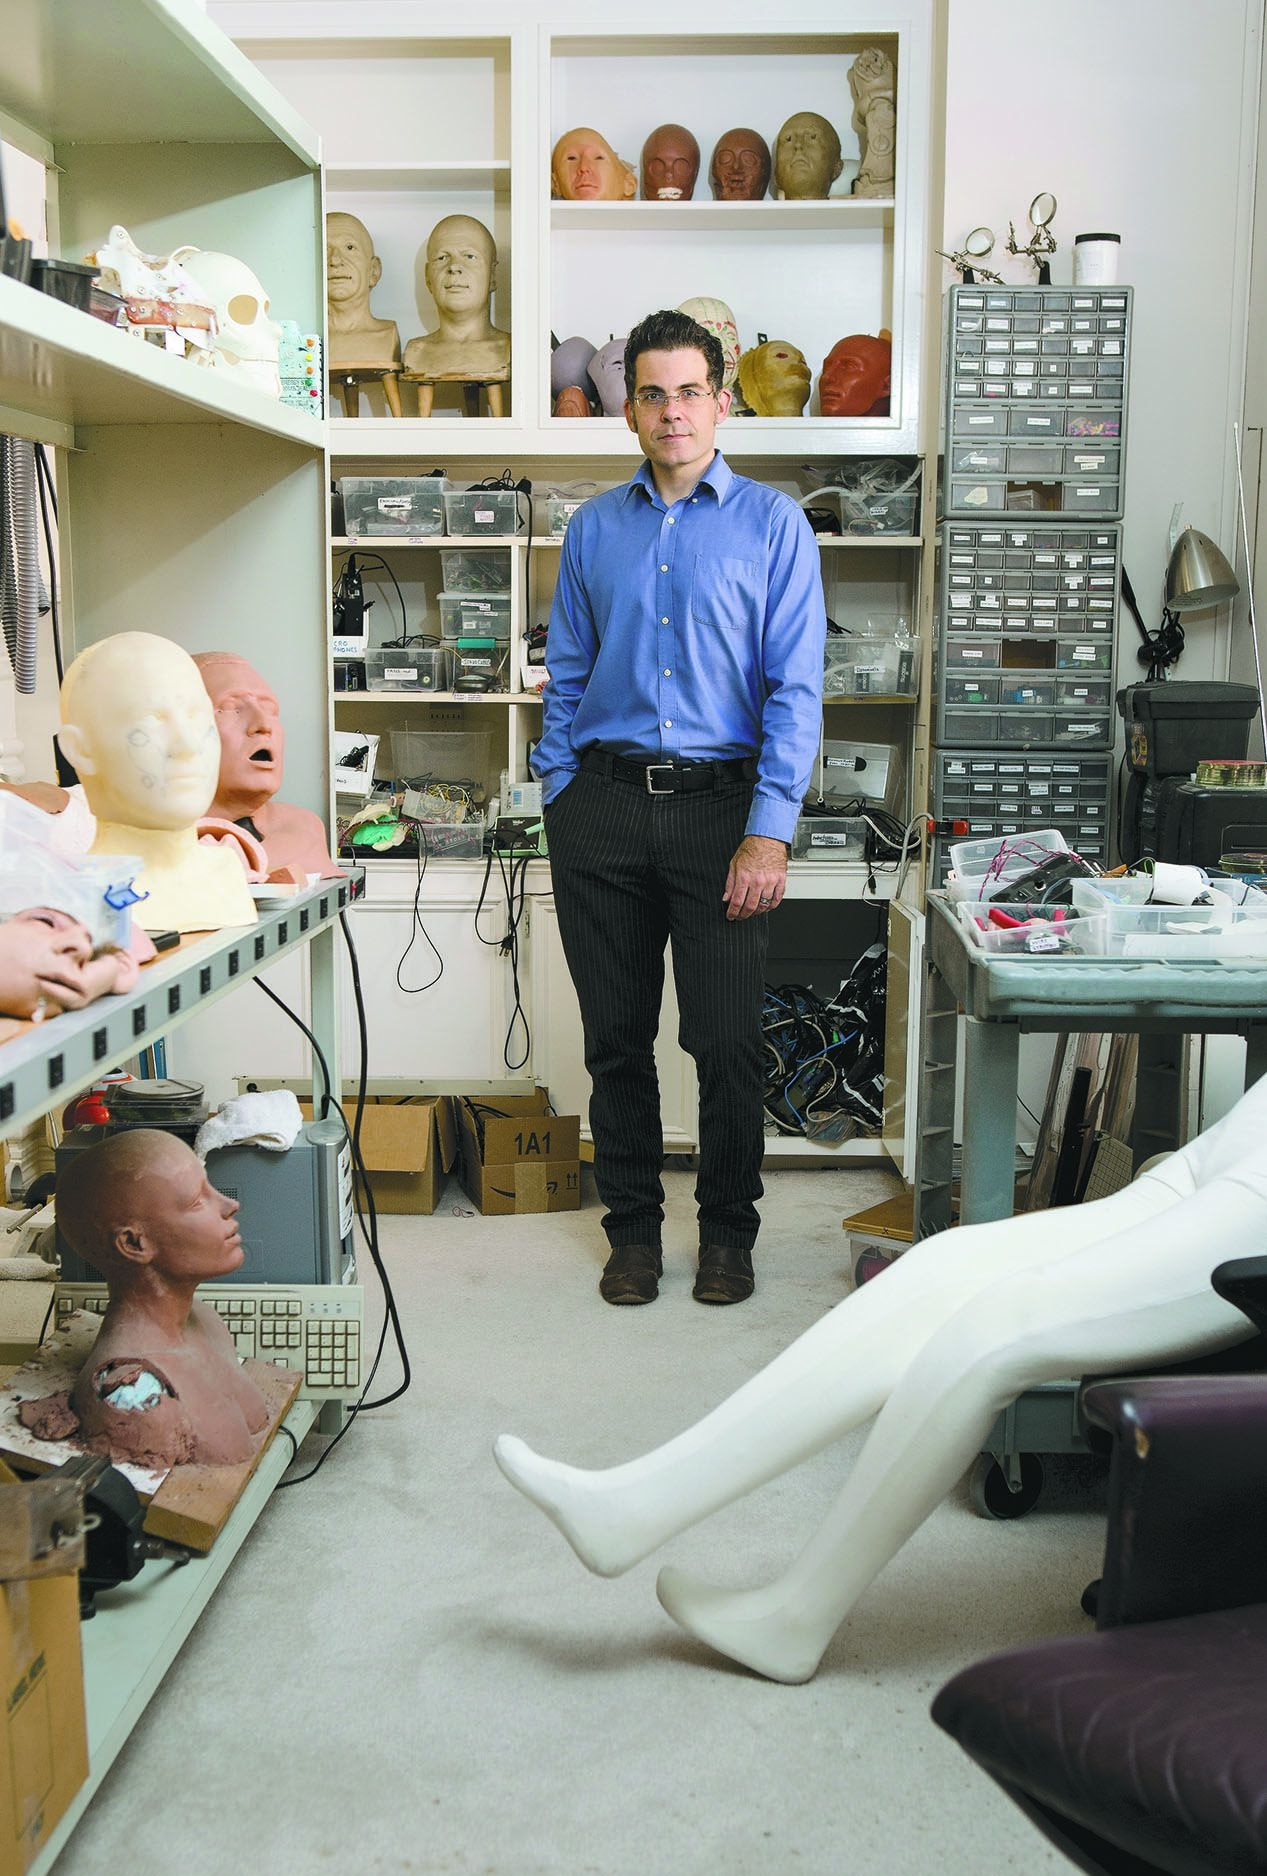 David Hanson shown in 2015 in his North Texas workspace.